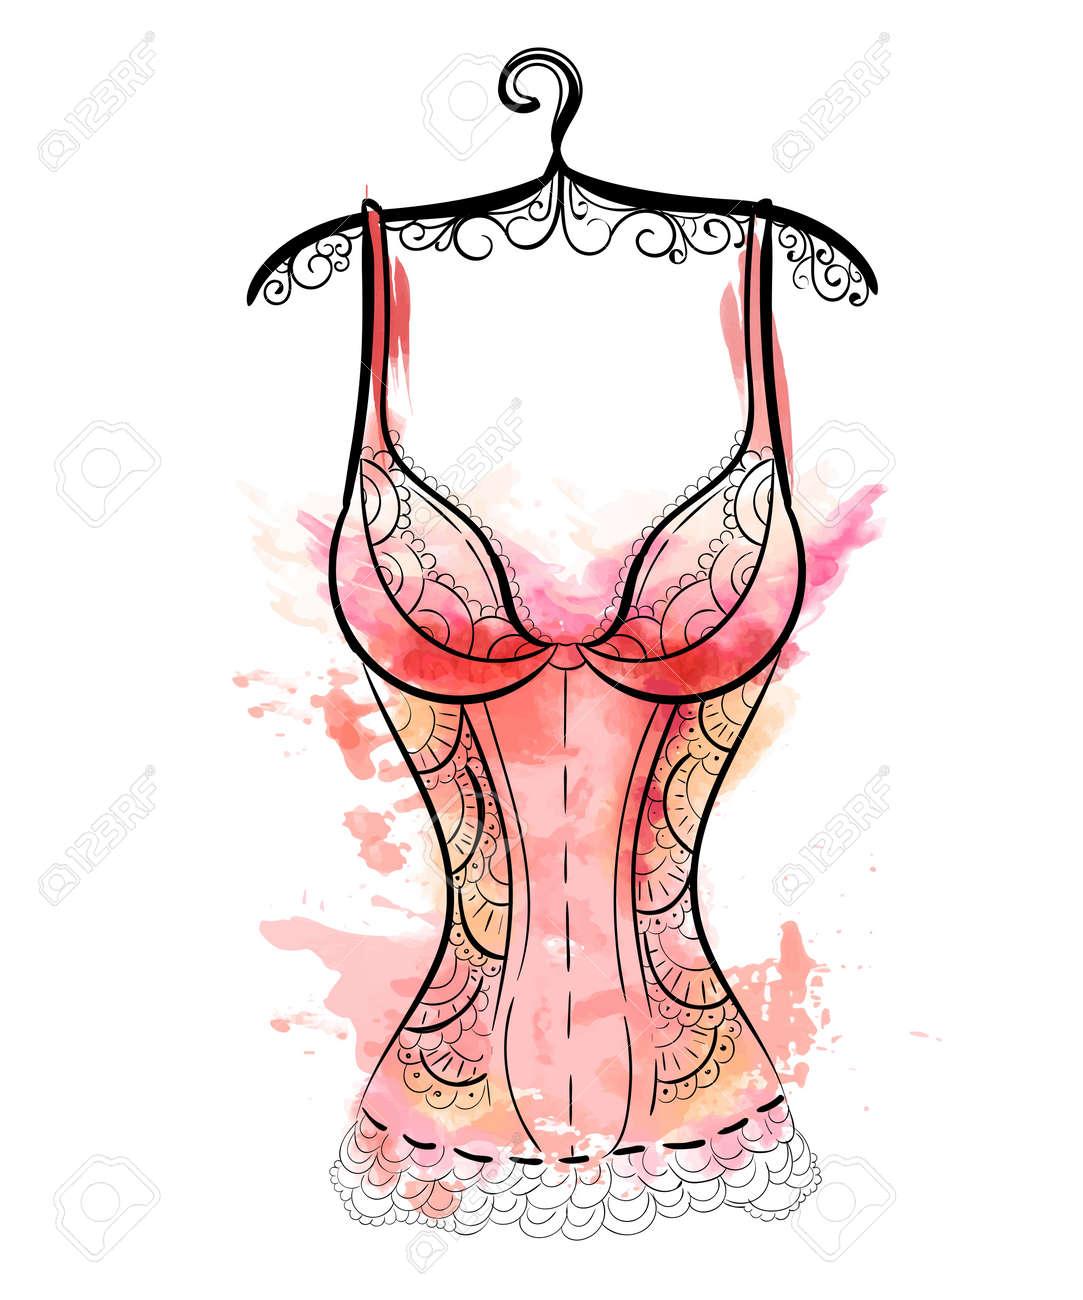 Female fashion lingerie. Sexy lacy lingerie set. Vector lingerie collection. - 58129854